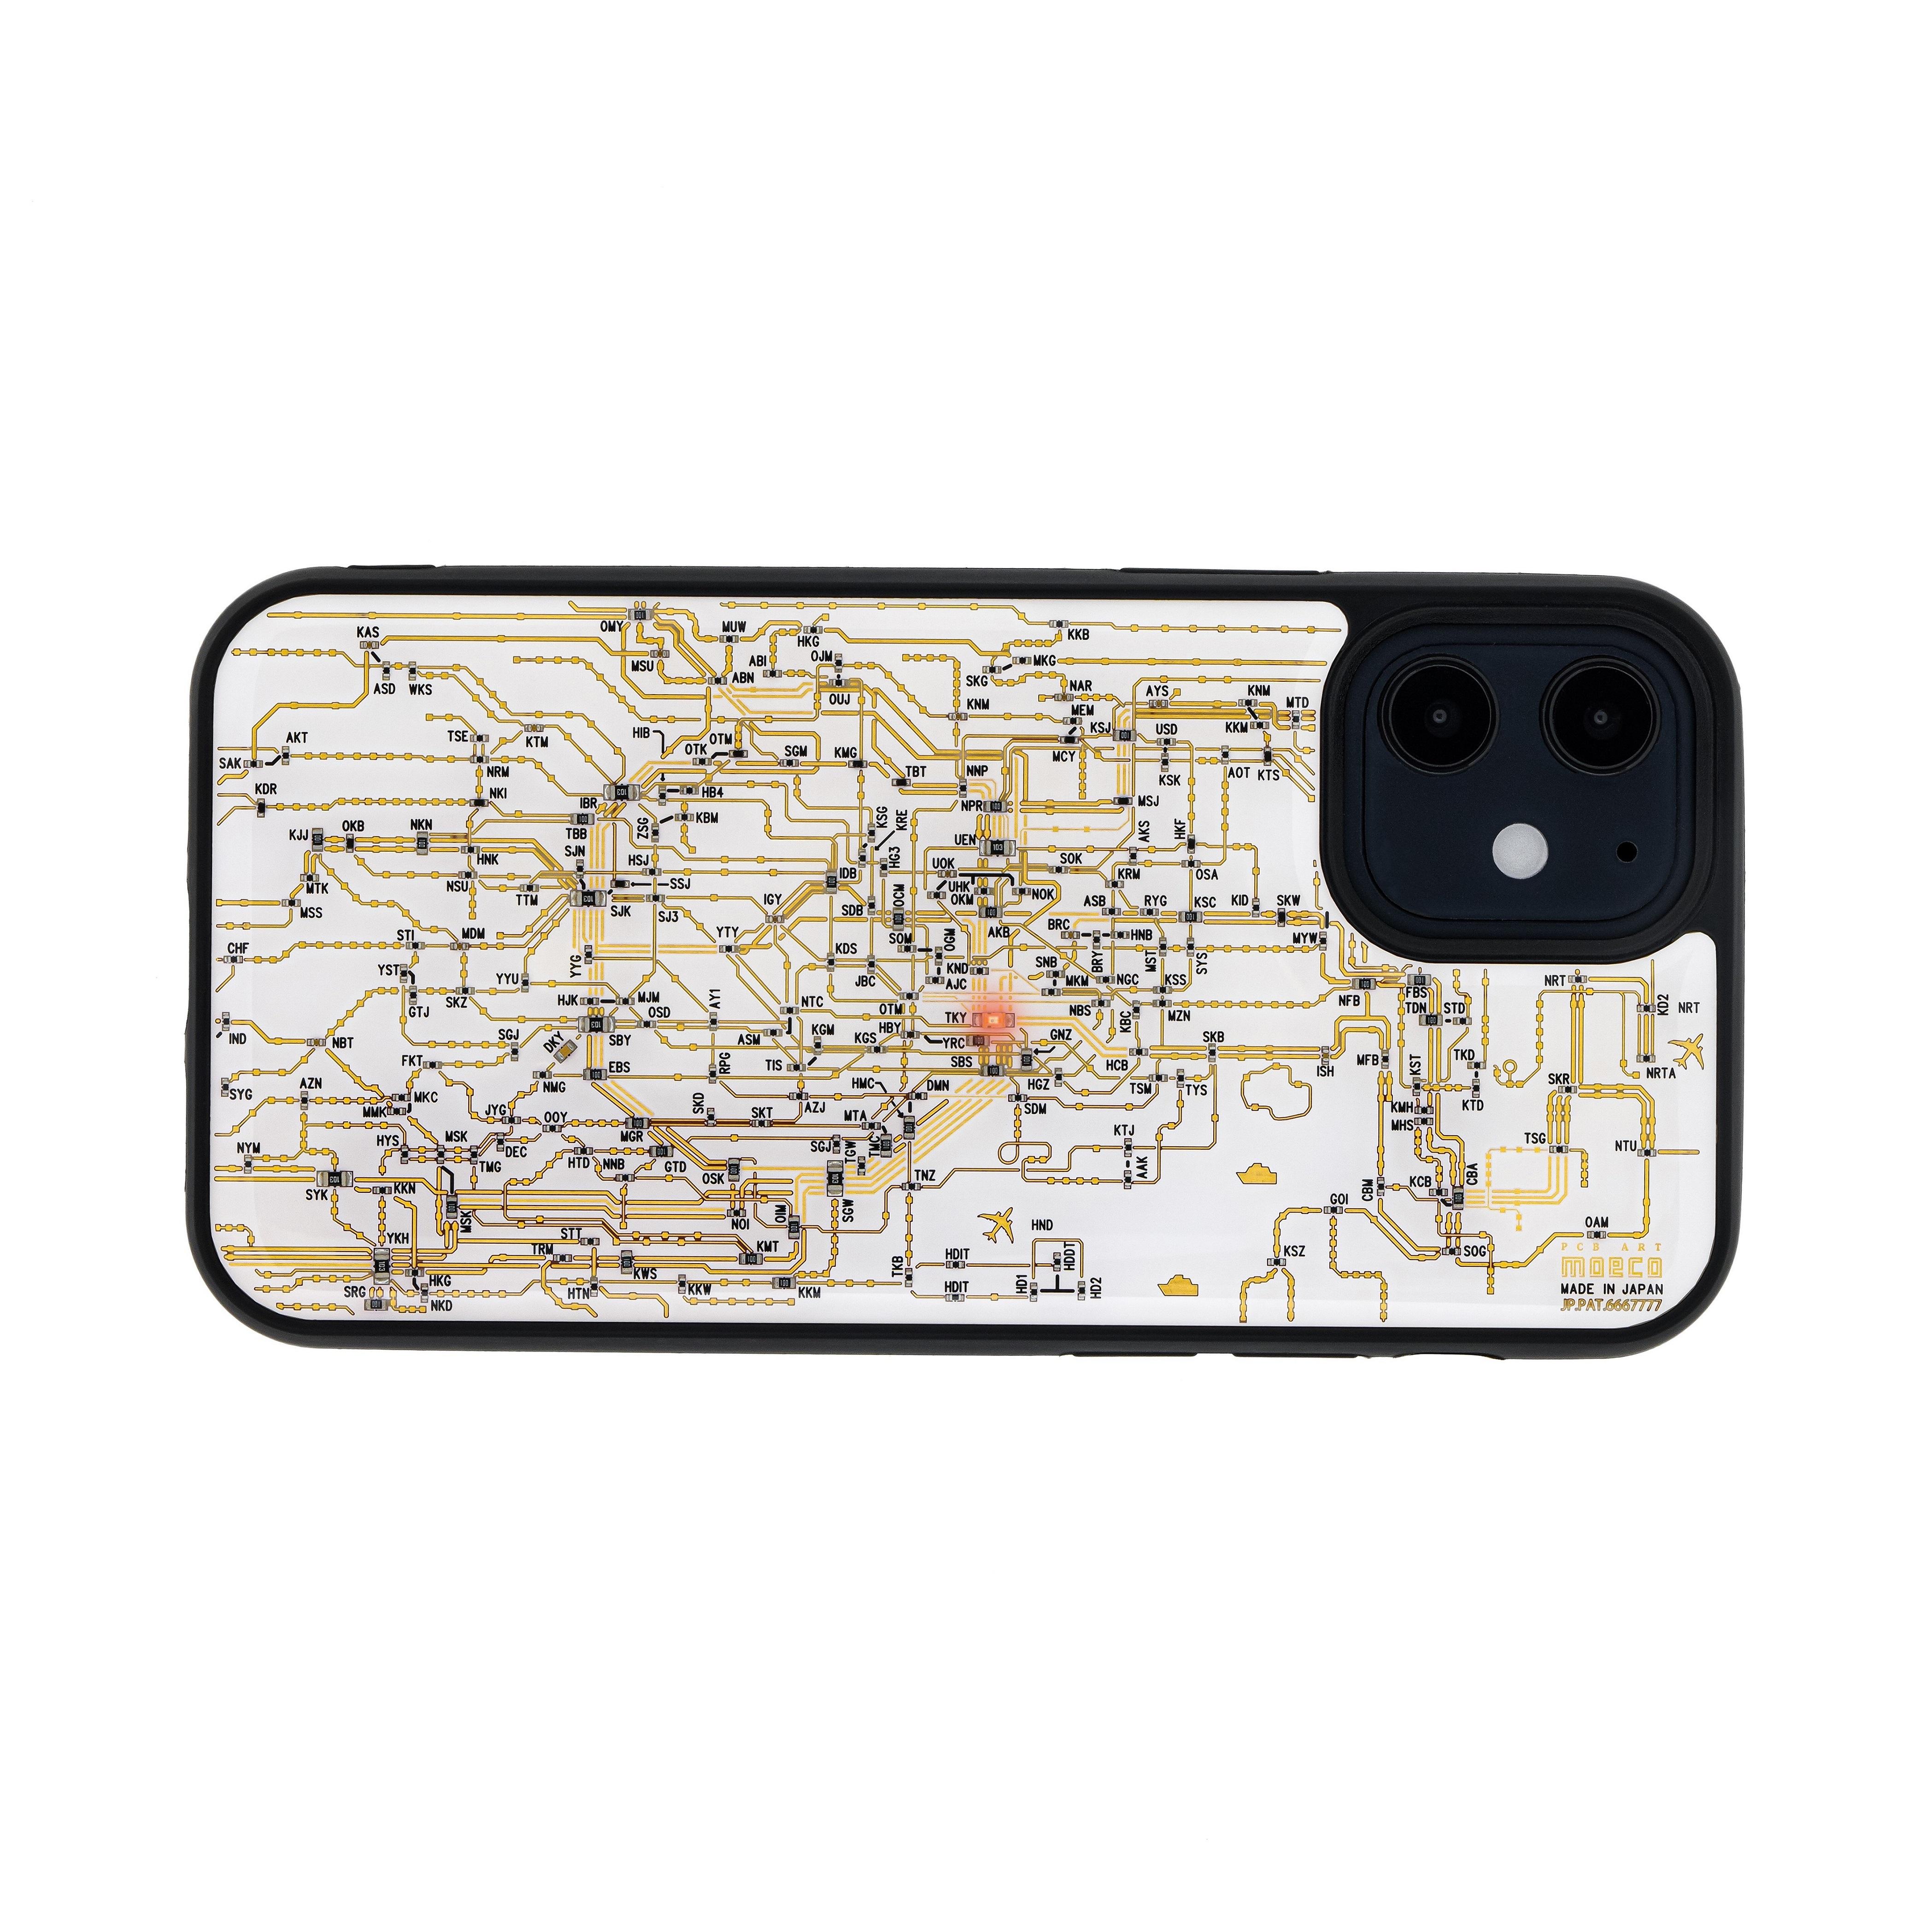 FLASH 東京回路線図 iPhone 12 mini ケース 白【東京回路線図A5クリアファイルをプレゼント】